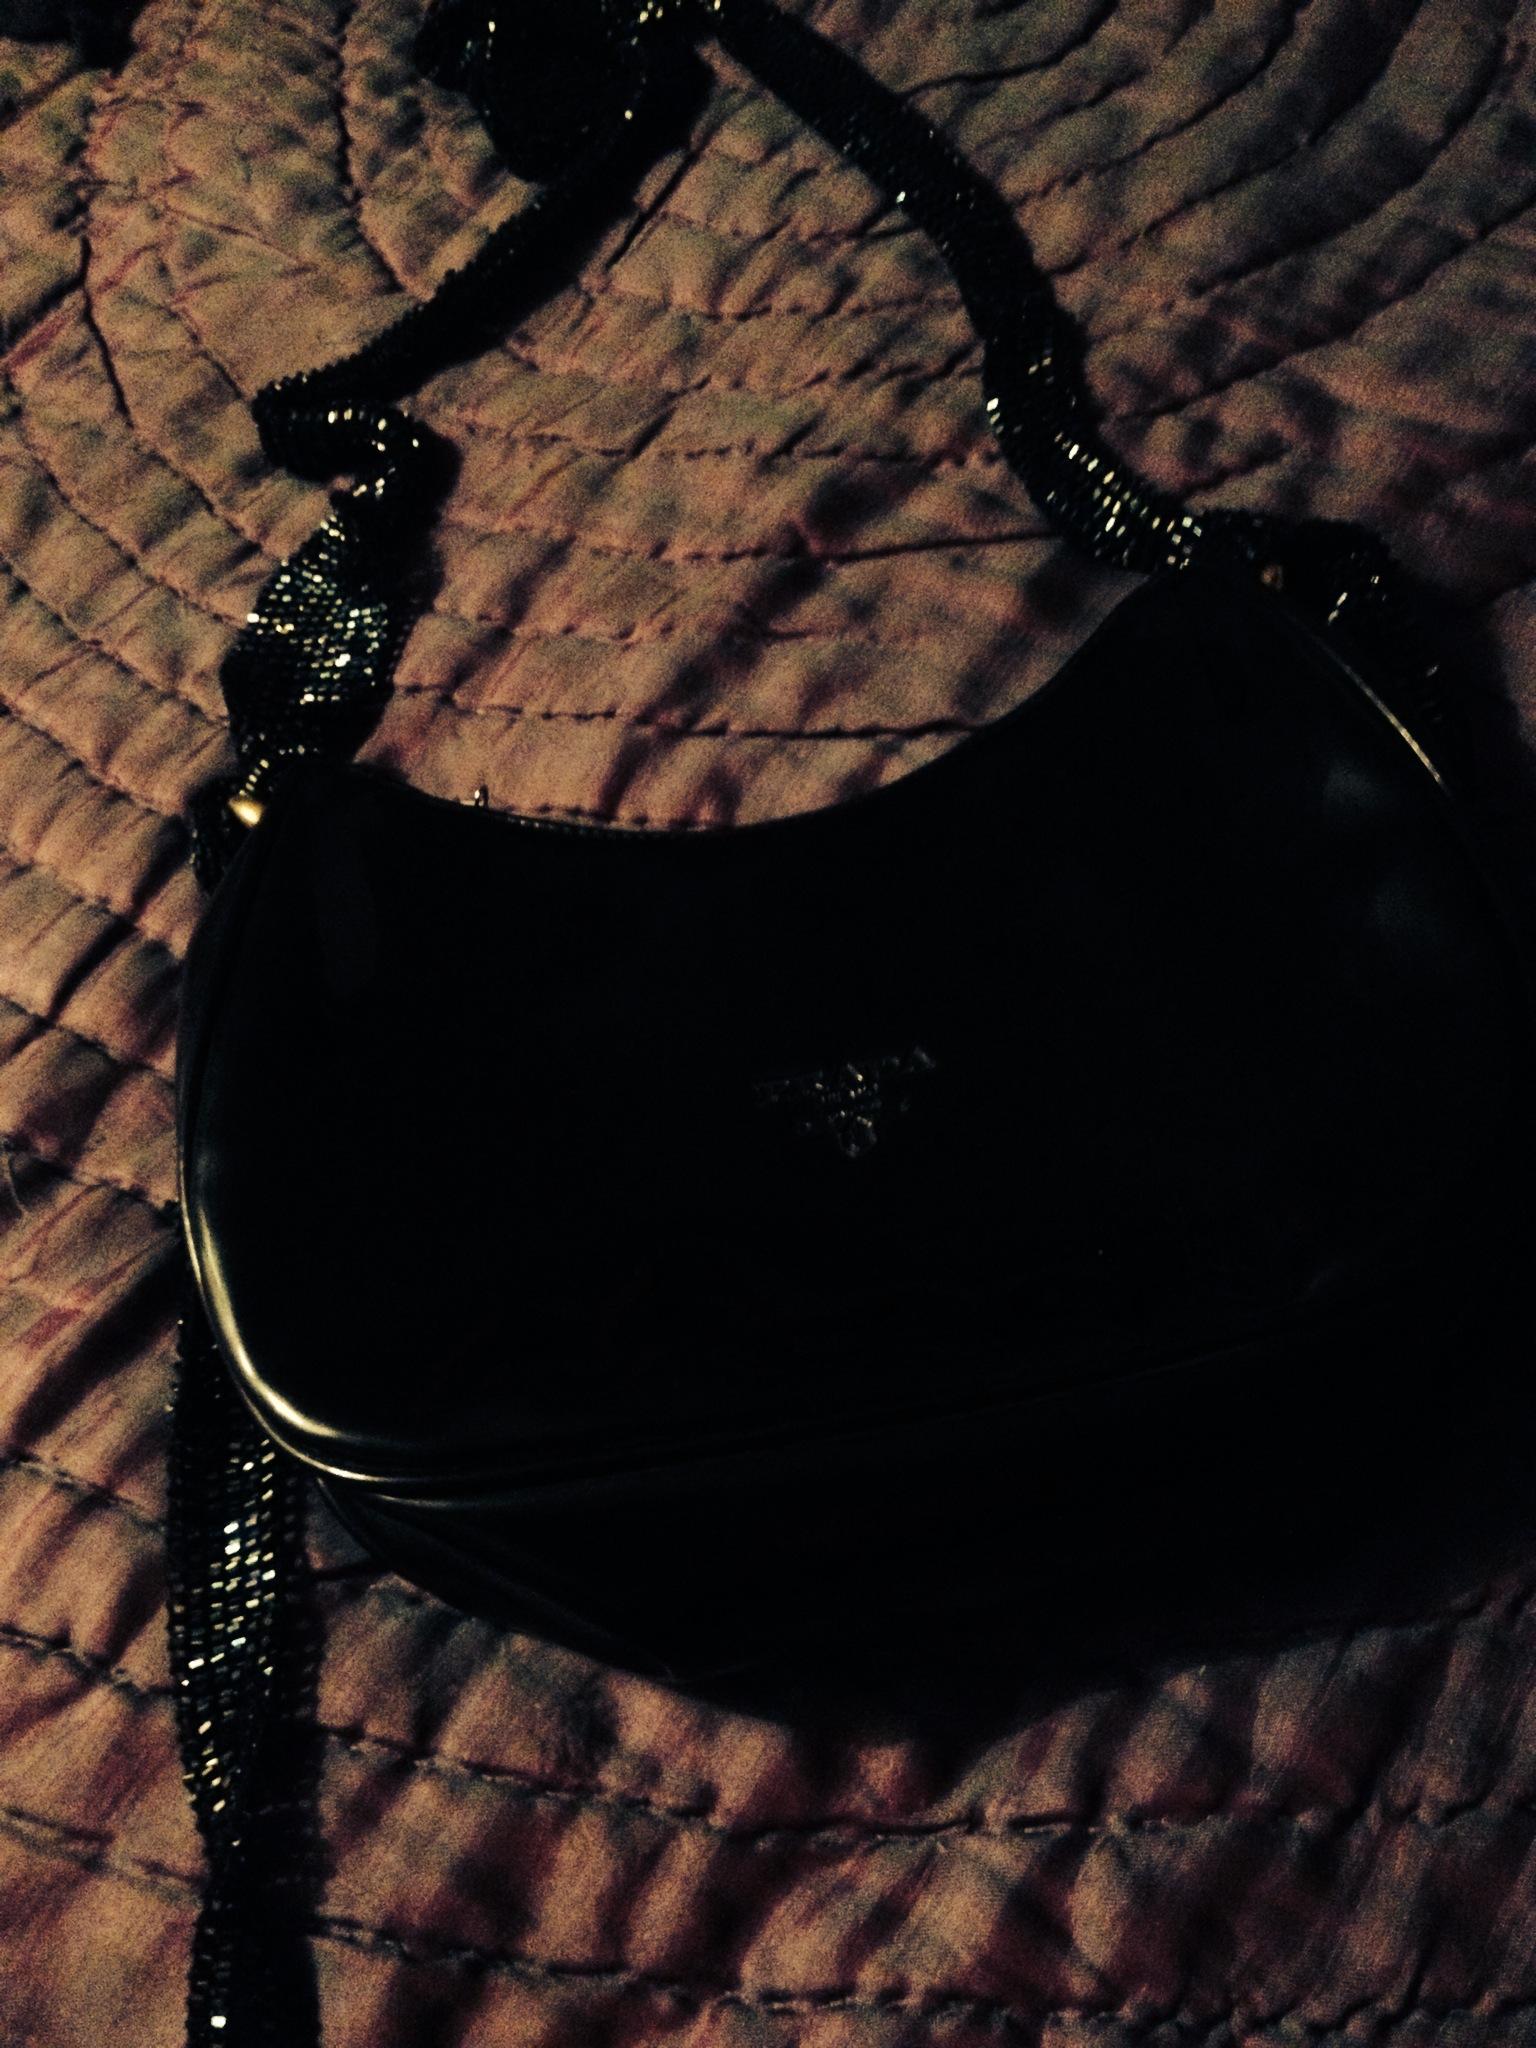 prada bags on sale canada - Fashion Trends �C Loved Worn Reborn's Blog